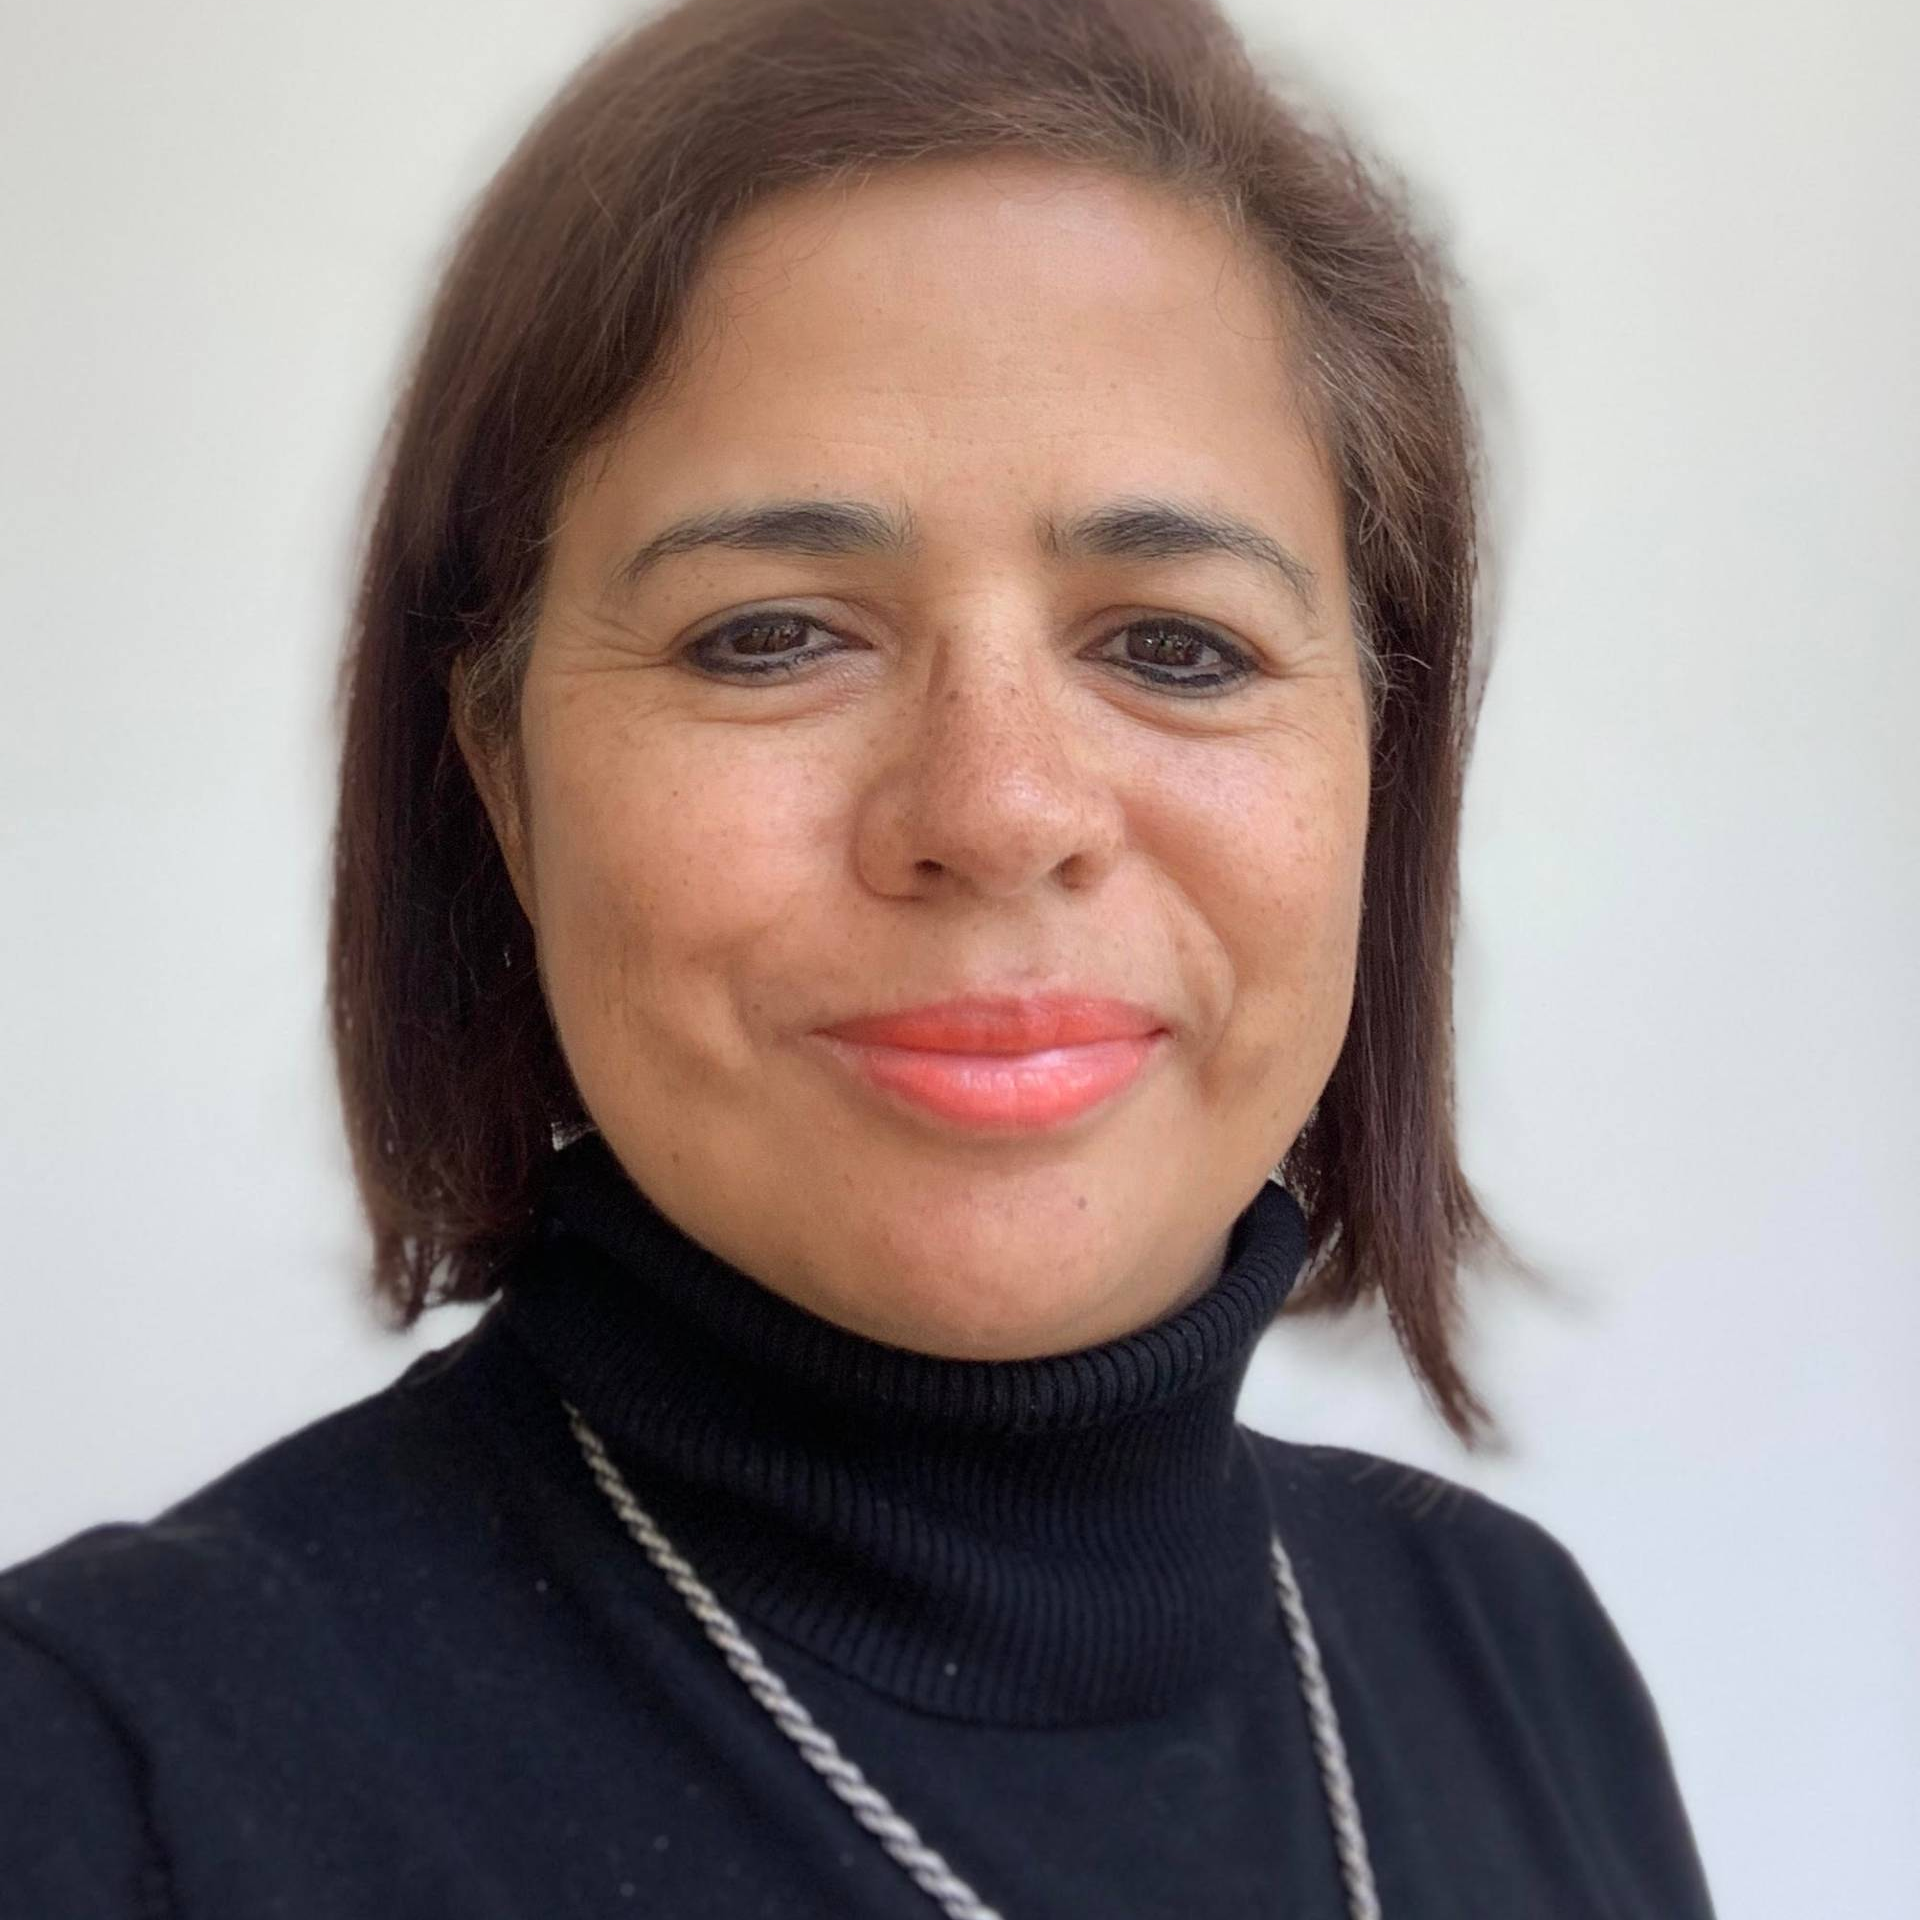 Claudia RUIZ GRAHAM